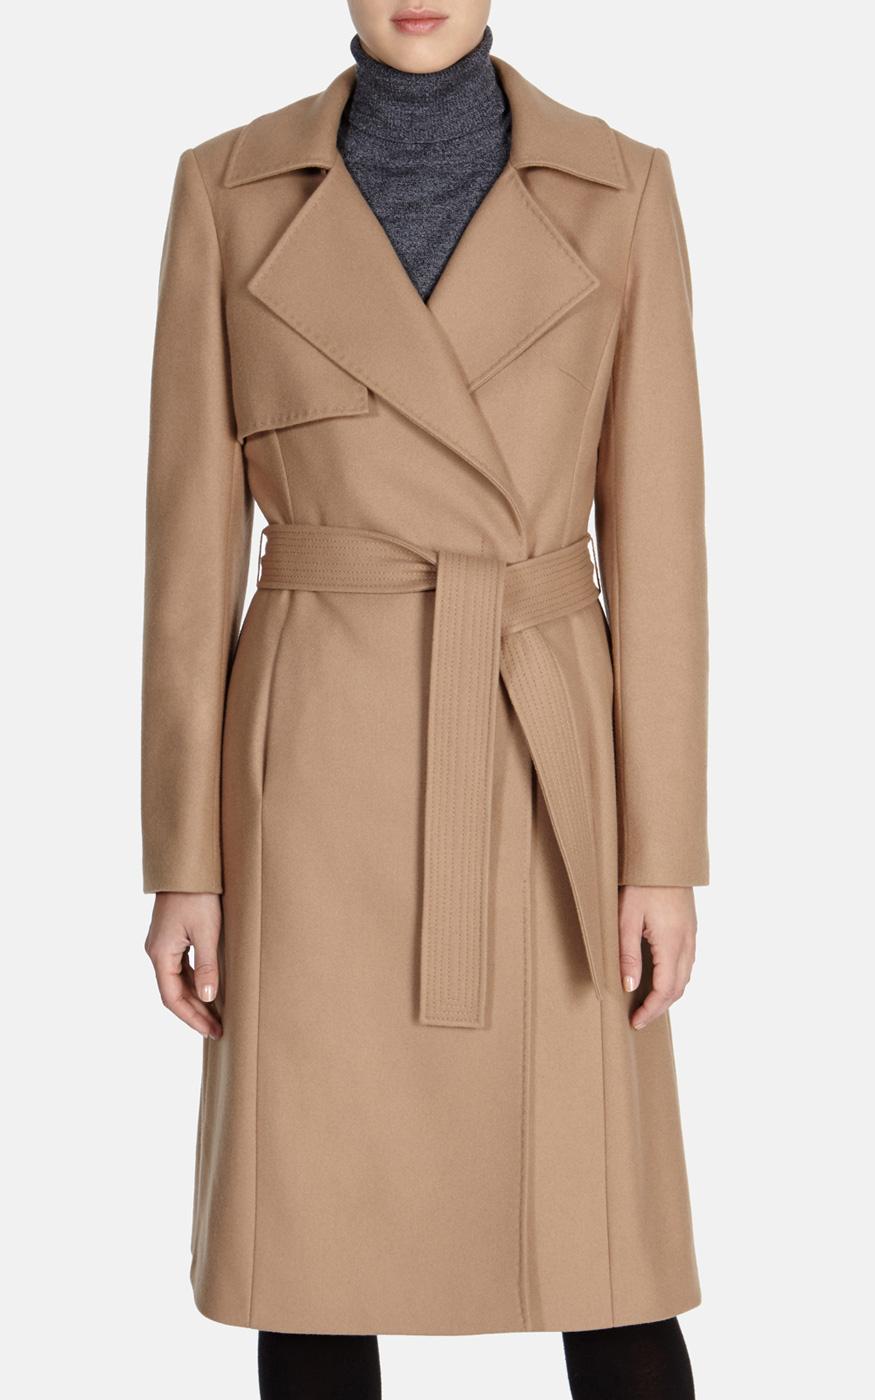 new design limpid in sight enjoy lowest price Karen Millen Ultimate Camel Coat in Natural - Lyst